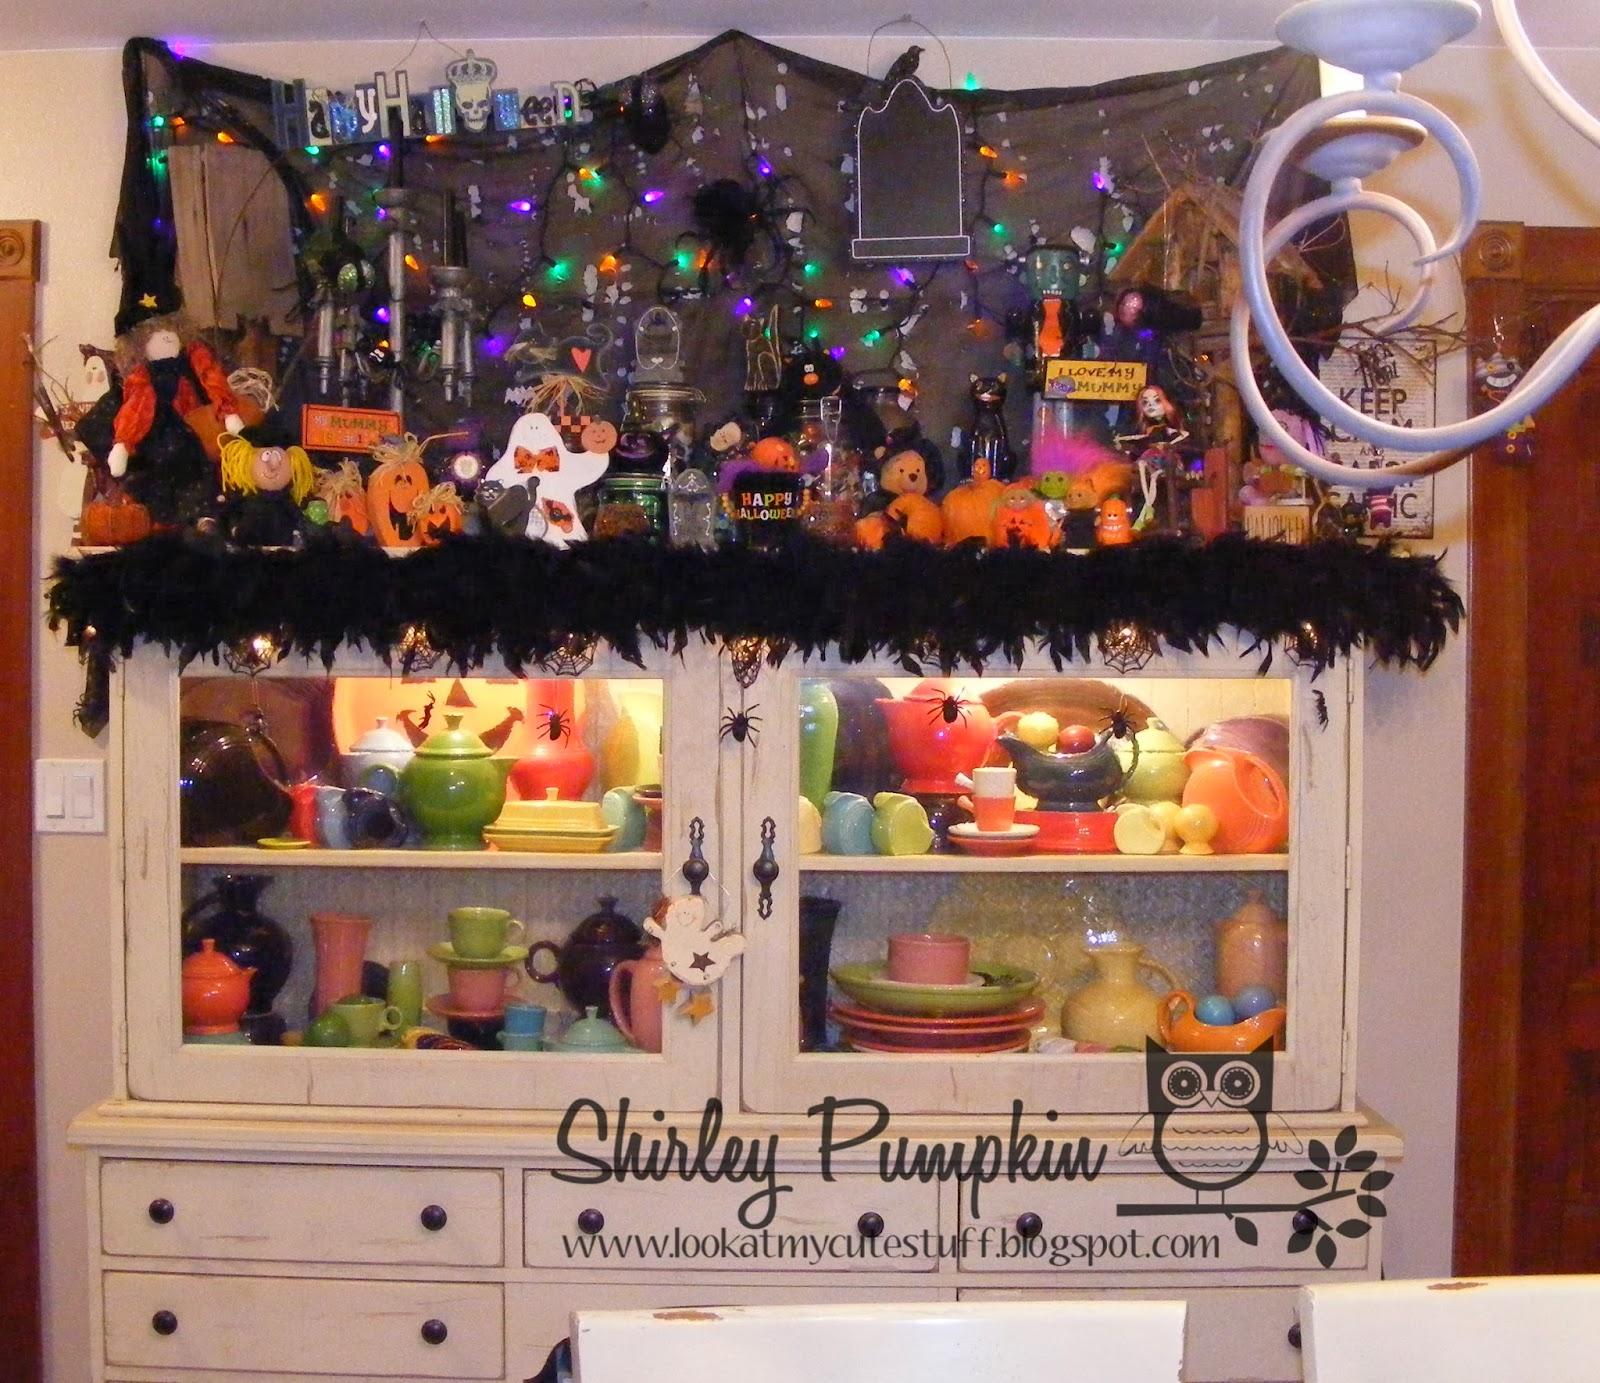 Cute stuff by shirley garage sale find to a fun spooky